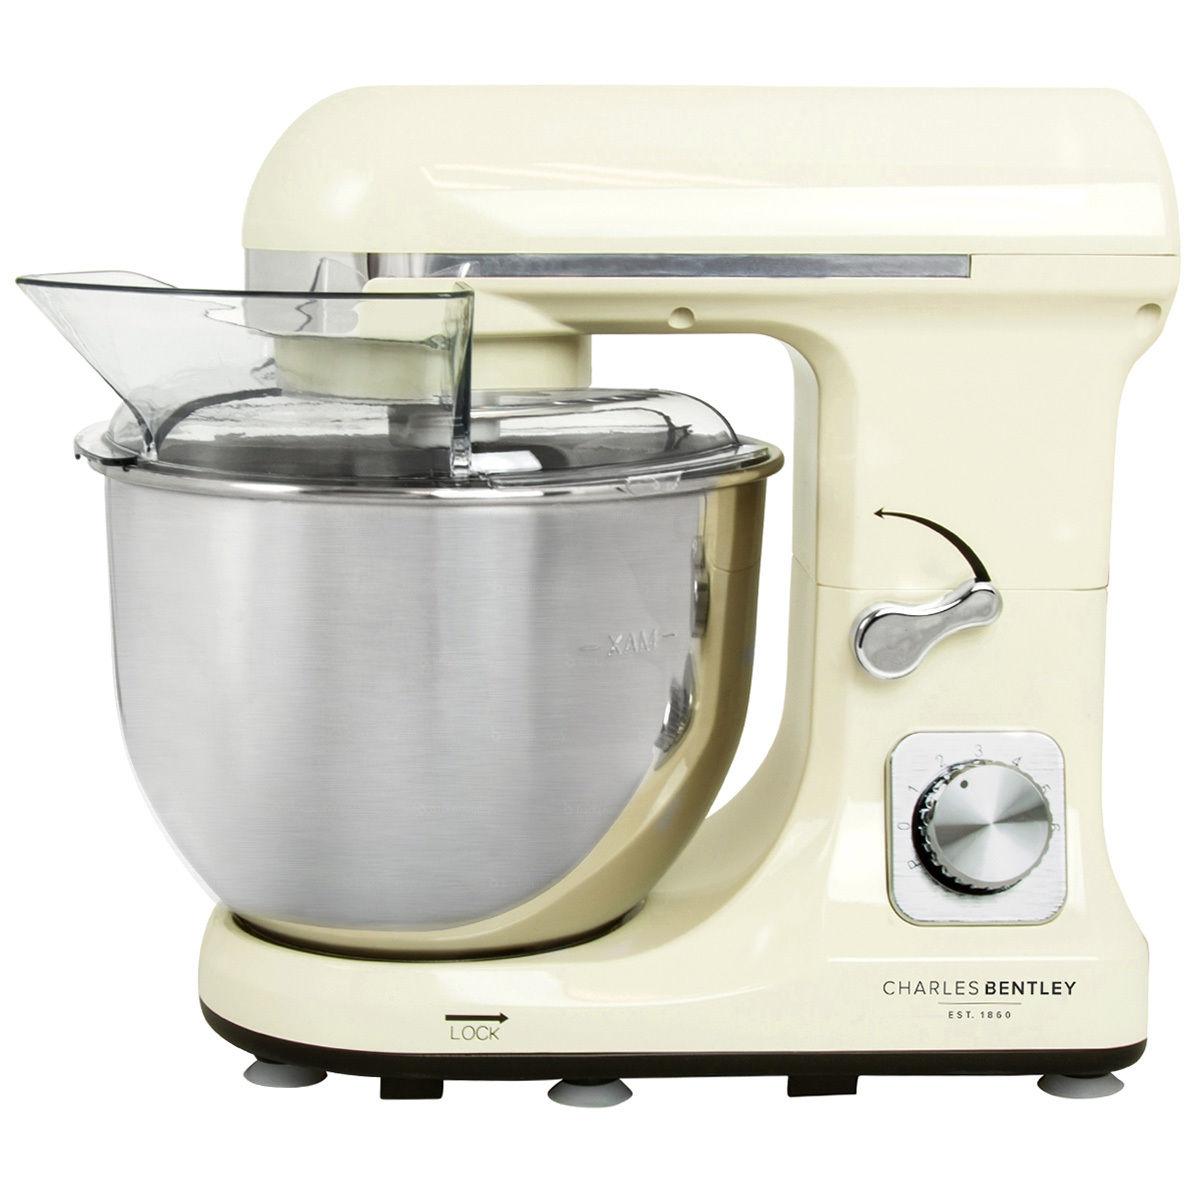 Charles Bentley 1000W Cream Meals Stand Mixer 5L Bowl, Splash Guard, Dough Hook